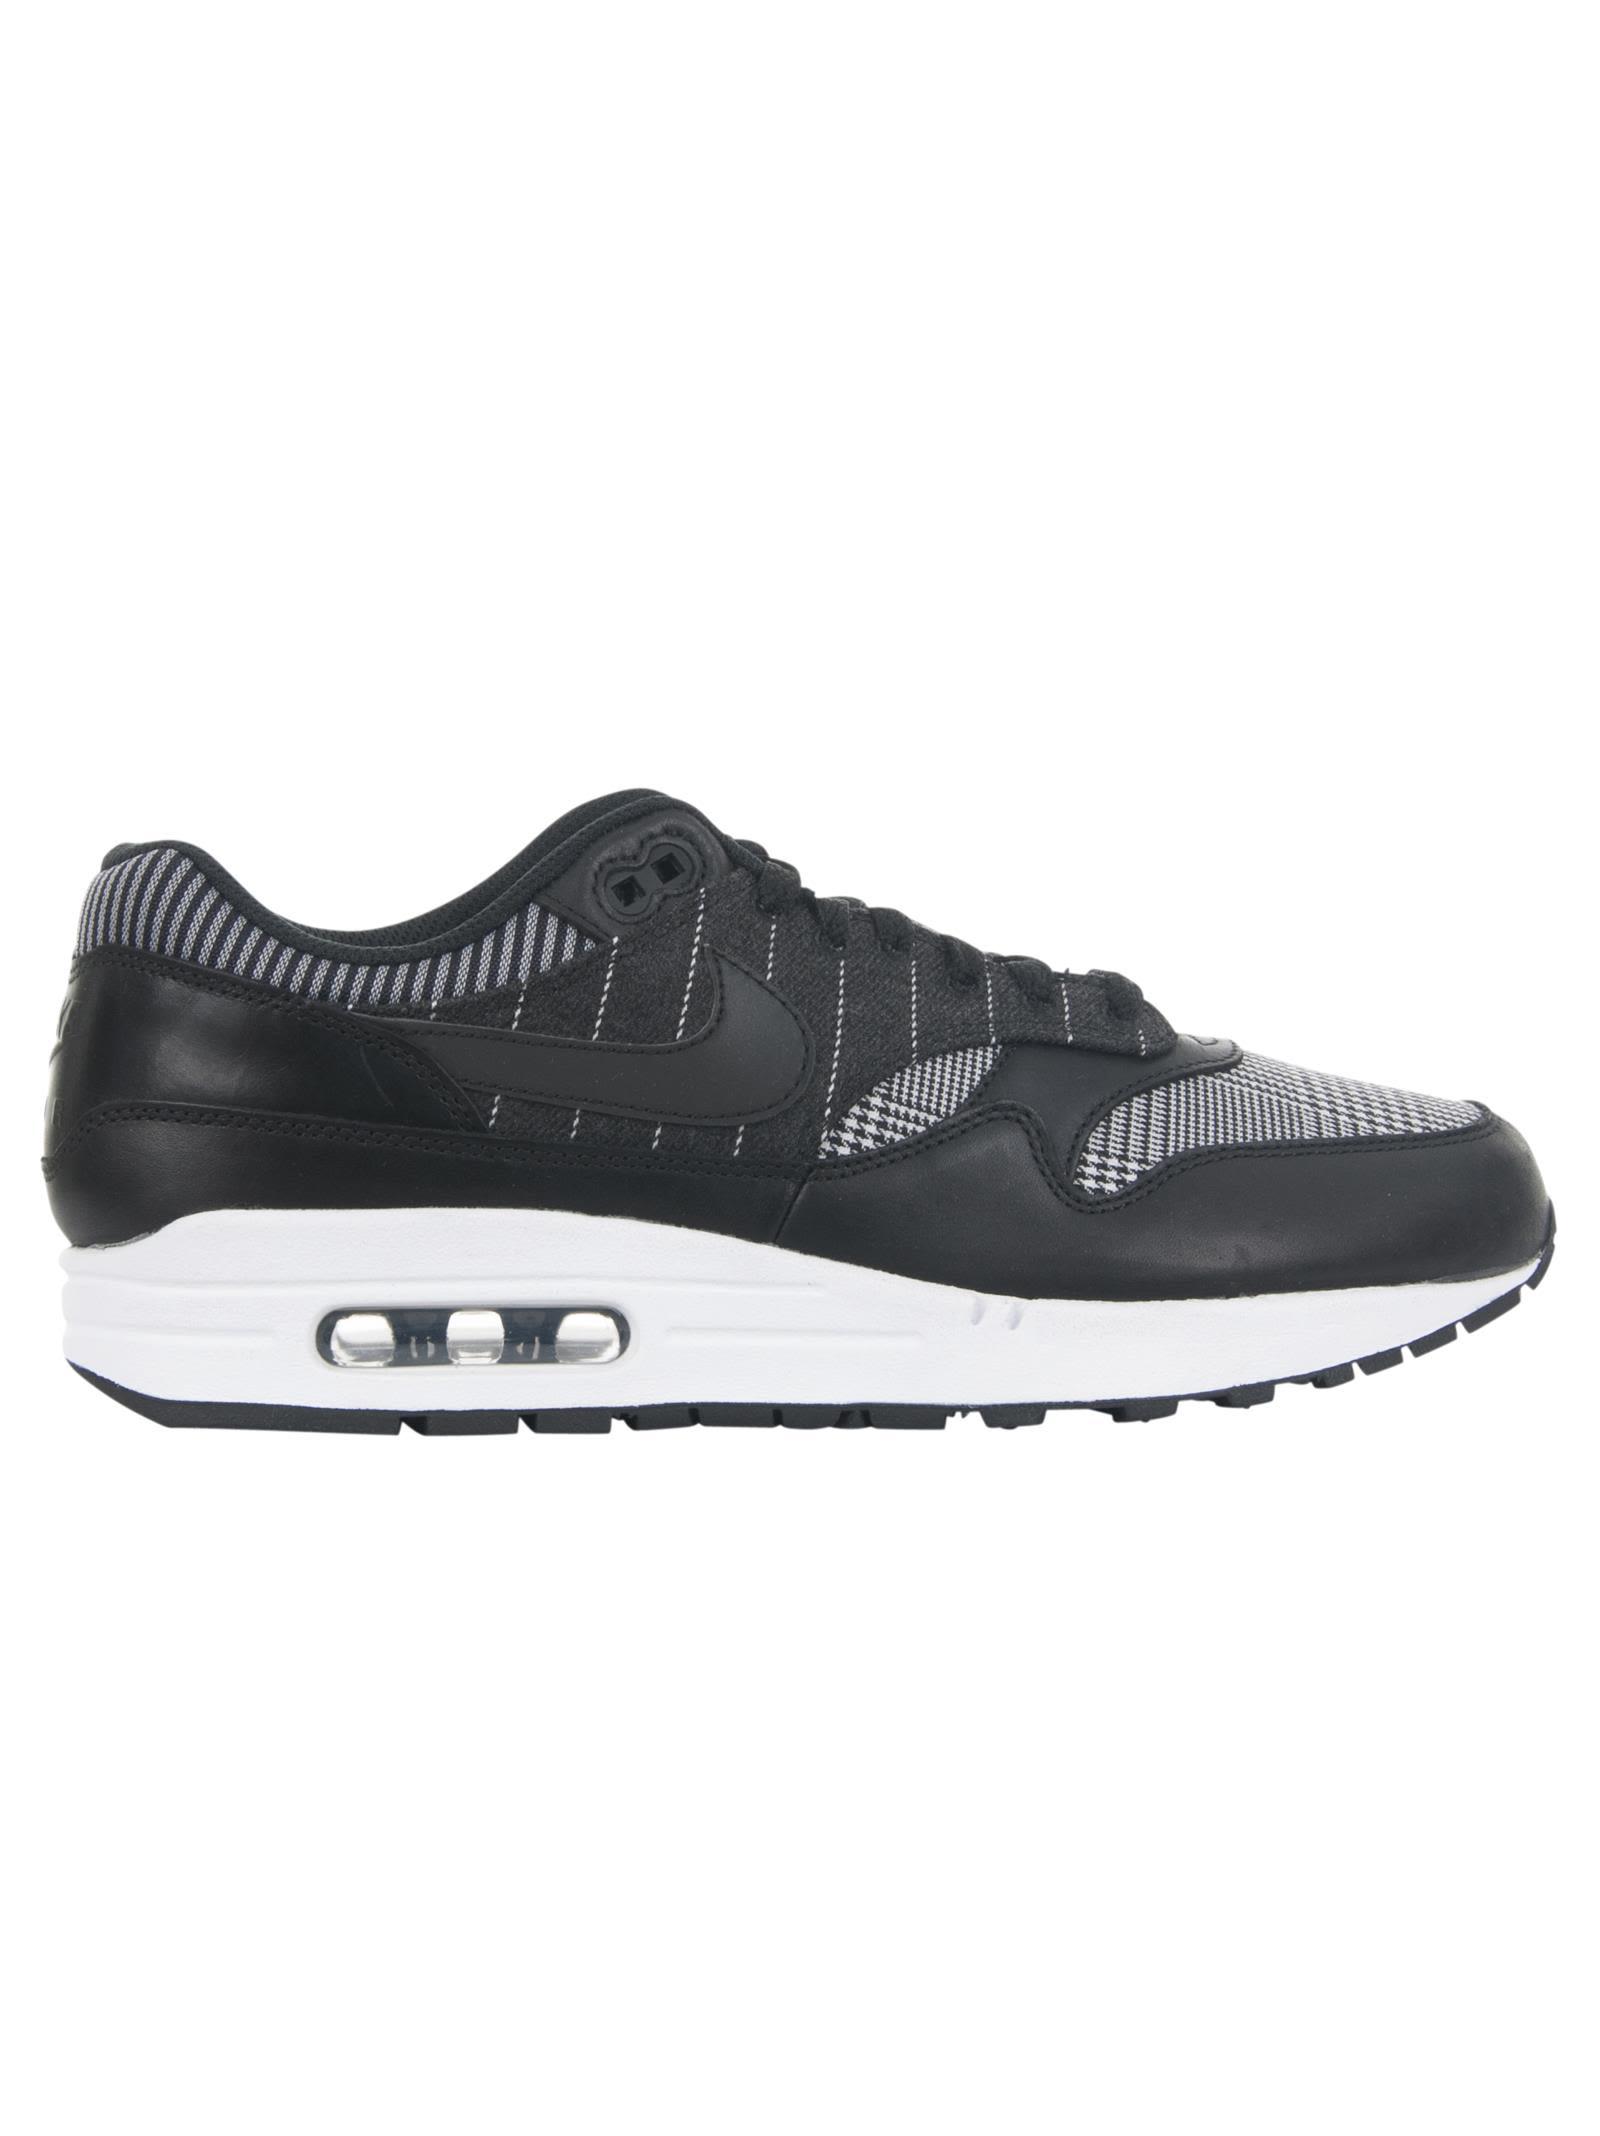 Nike Shoes WMNS NIKE AIR MAX 1 SE